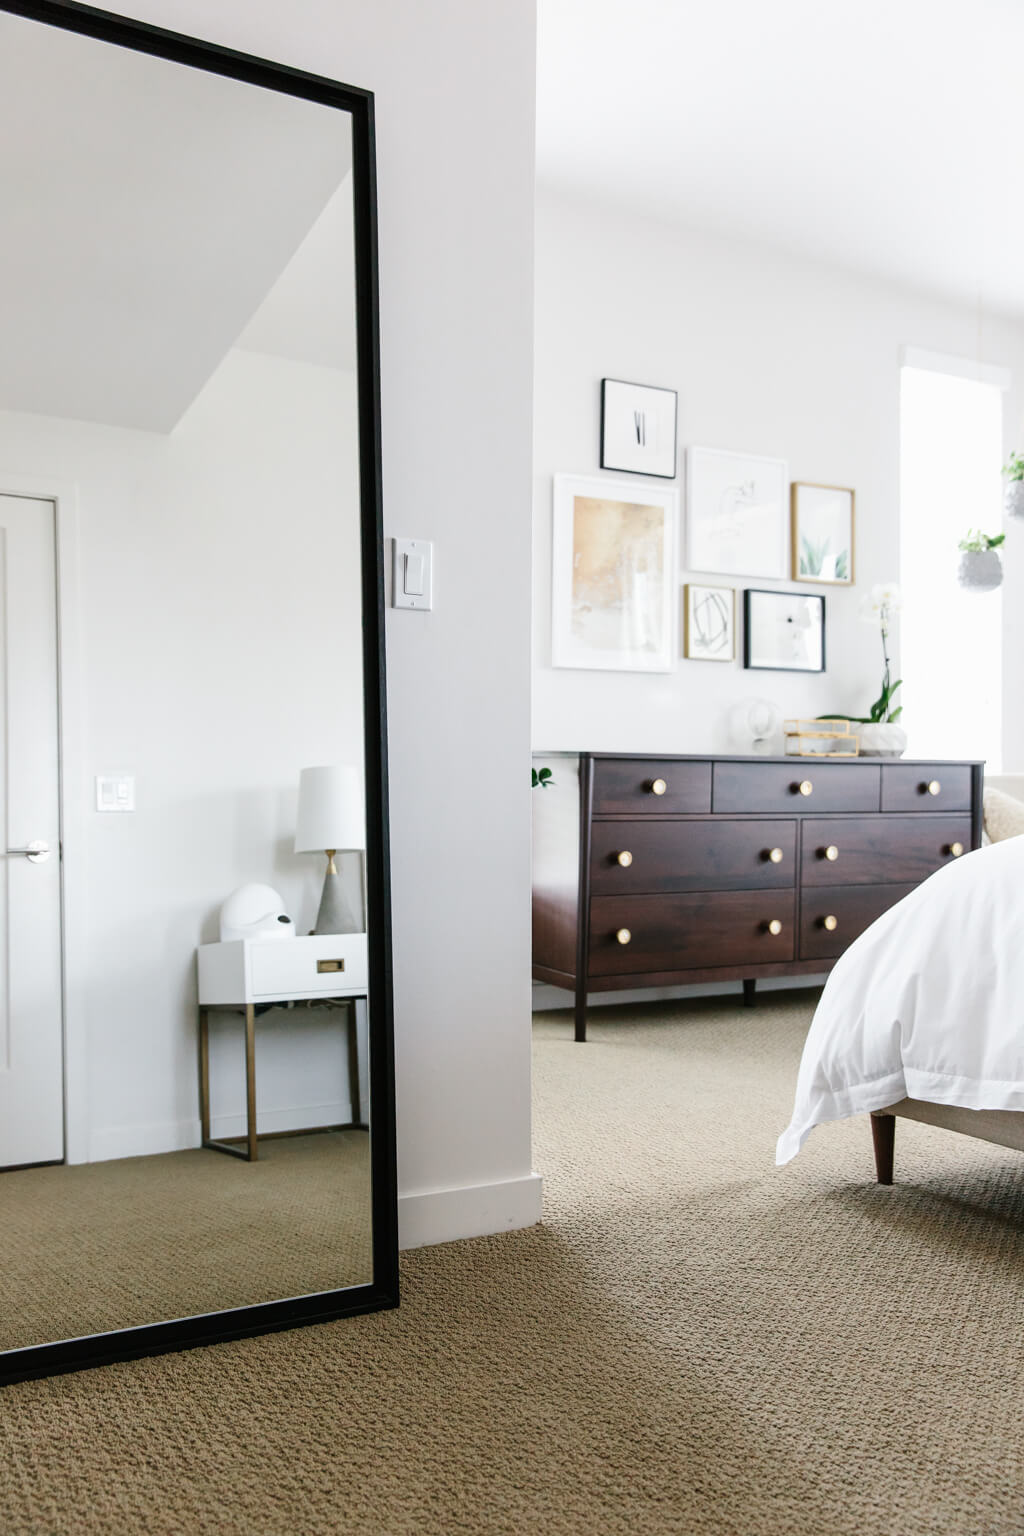 My Modern and Minimalist Bedroom Design with Havenly ... on Minimalist Bedroom Ideas  id=36561